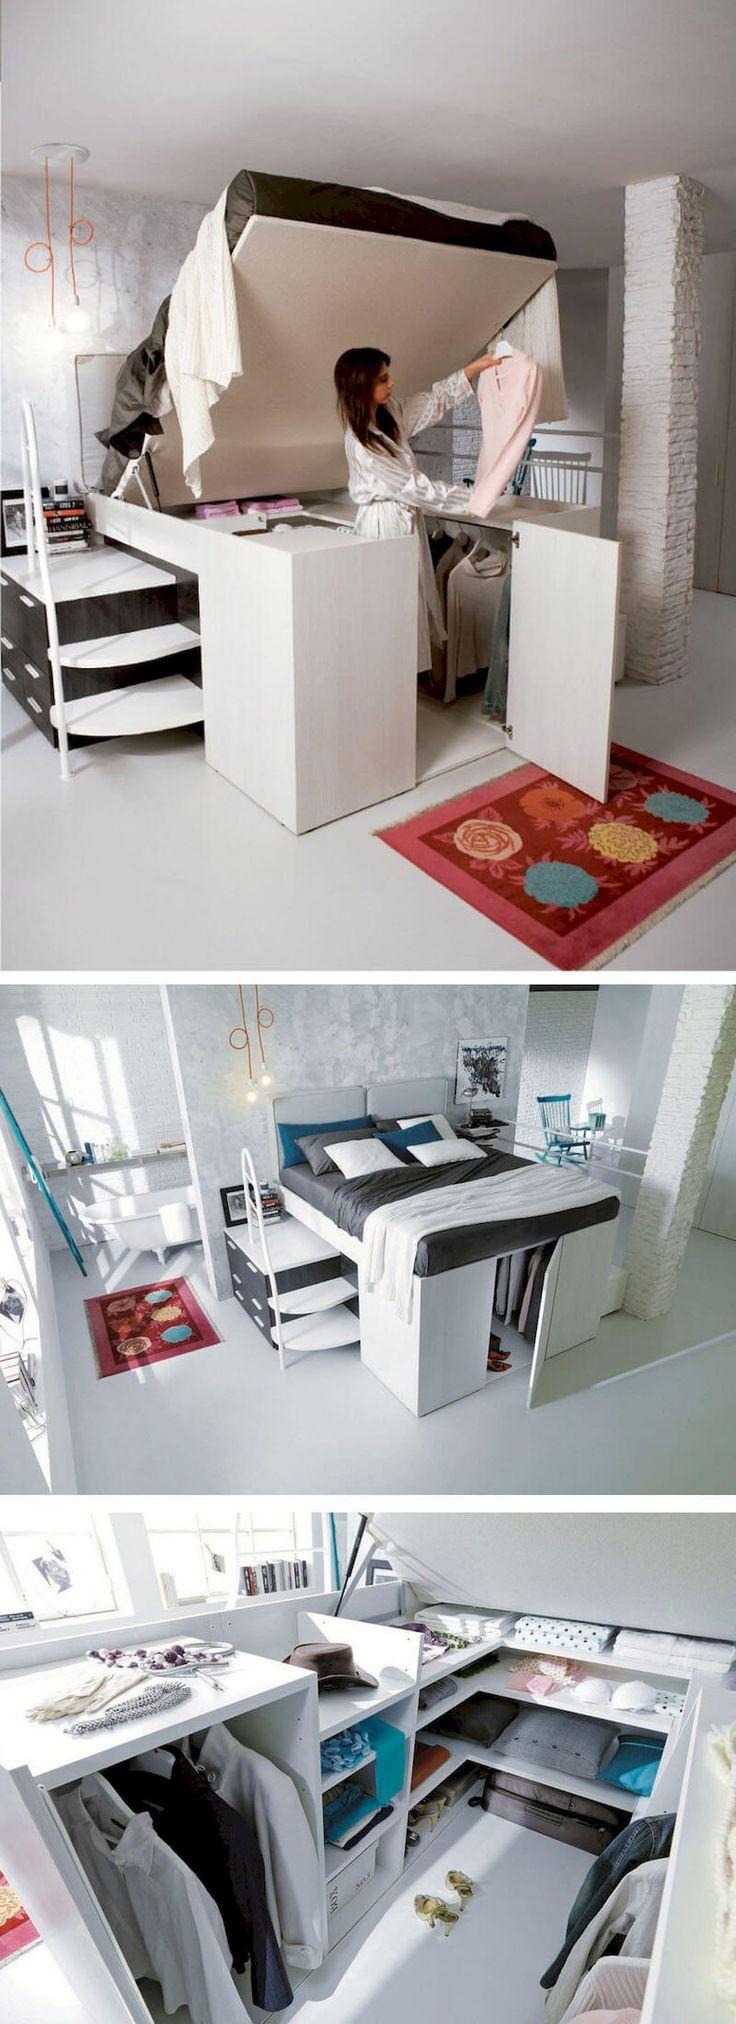 12 best Ahorro de espacio images on Pinterest | Home ideas ...